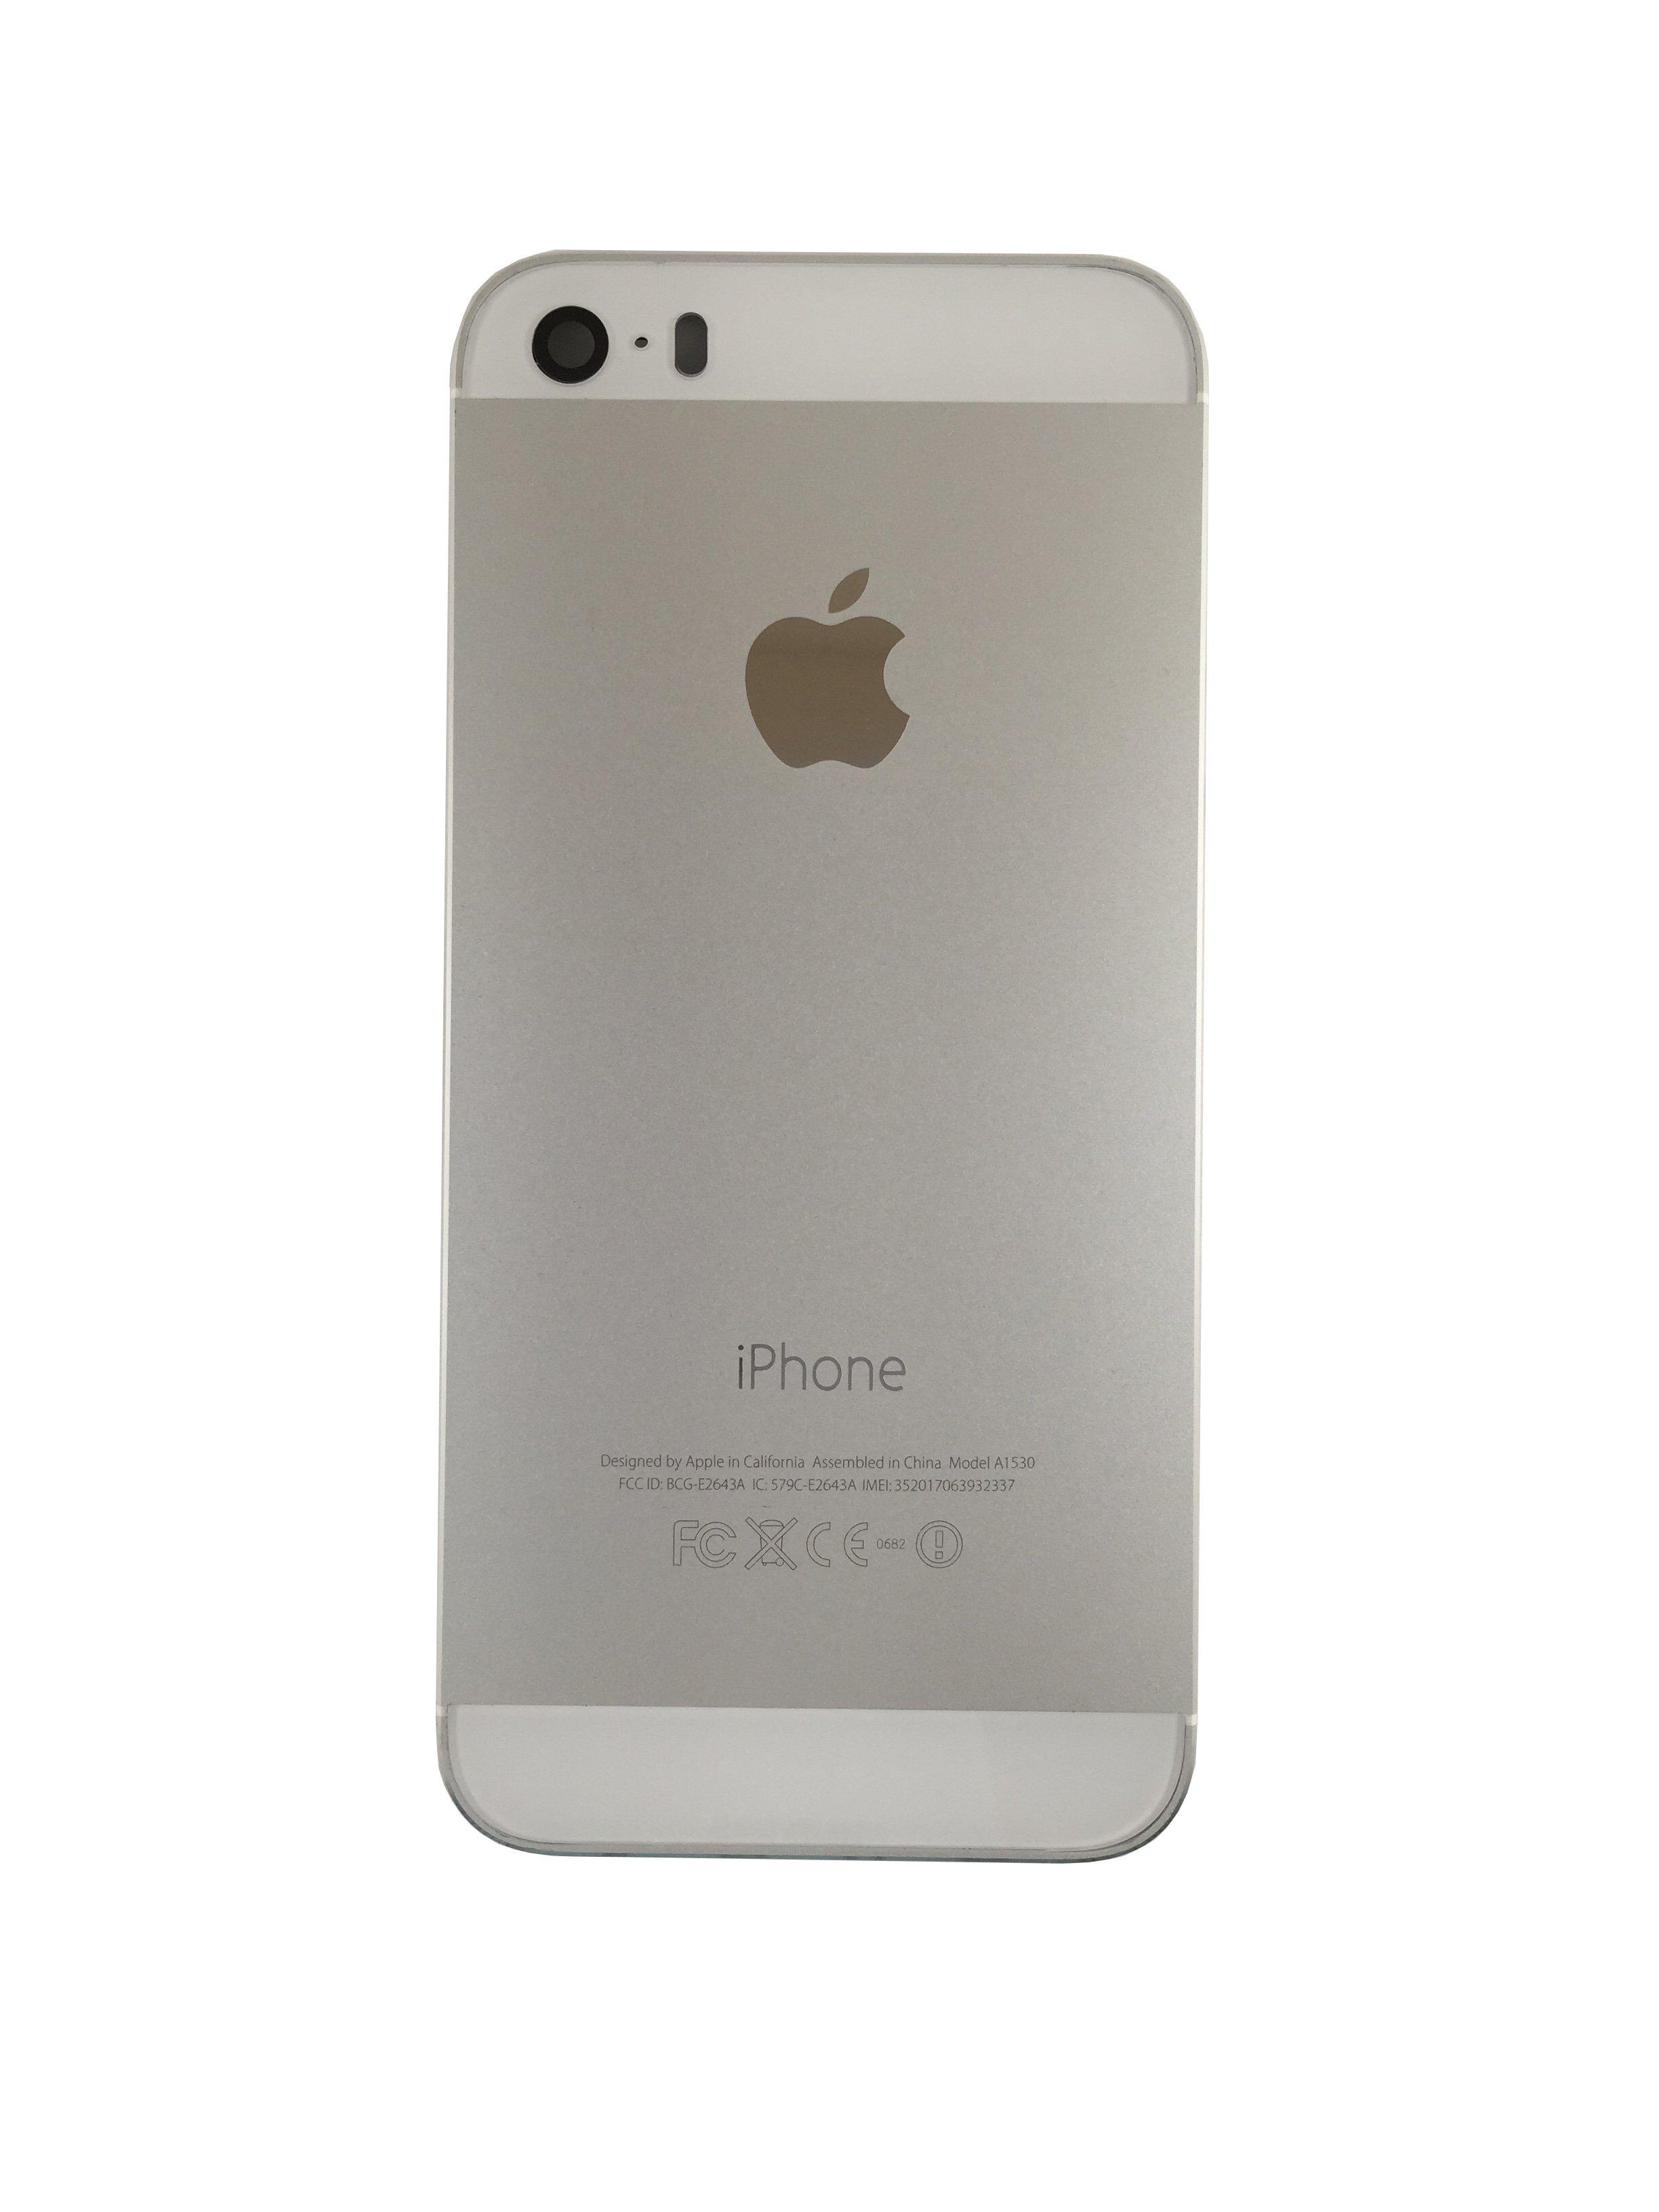 Замена корпуса iPhone 5S (Айфон 5S) недорого Сервисный Центр Apple 3dc09d11e4630